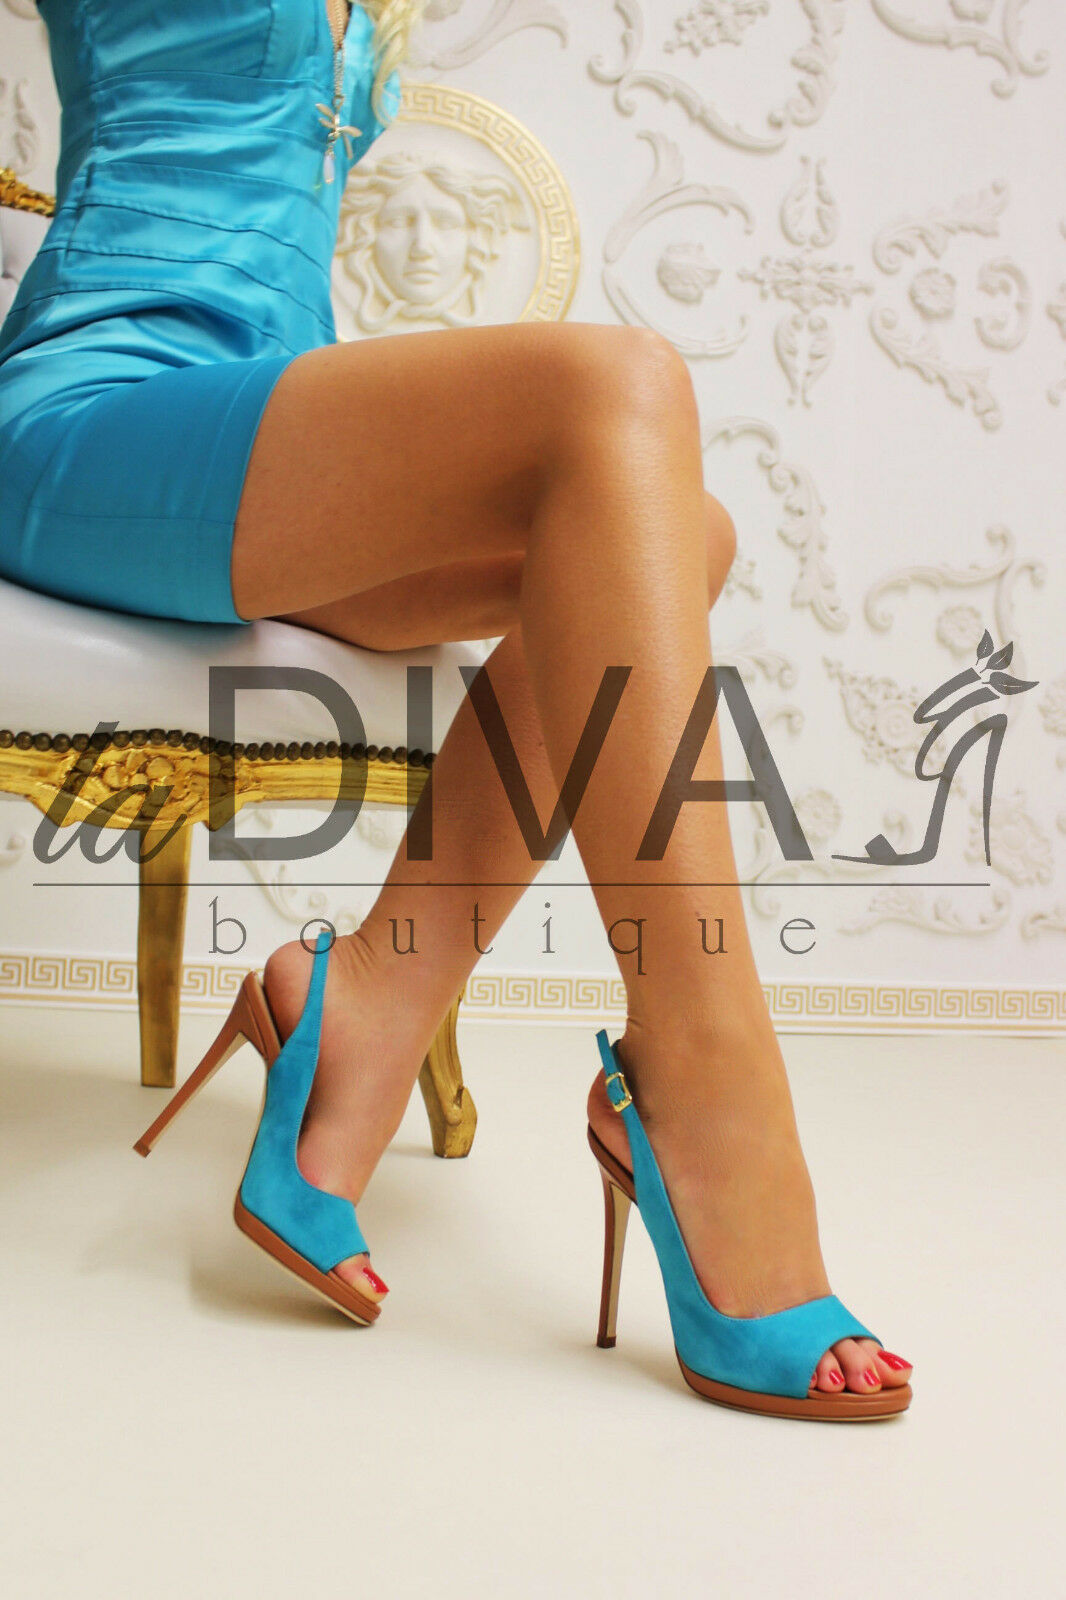 MICHELE SOZIO   Wildleder Pumps Peep Toe 39 türkis bleu cognac Leder Heels